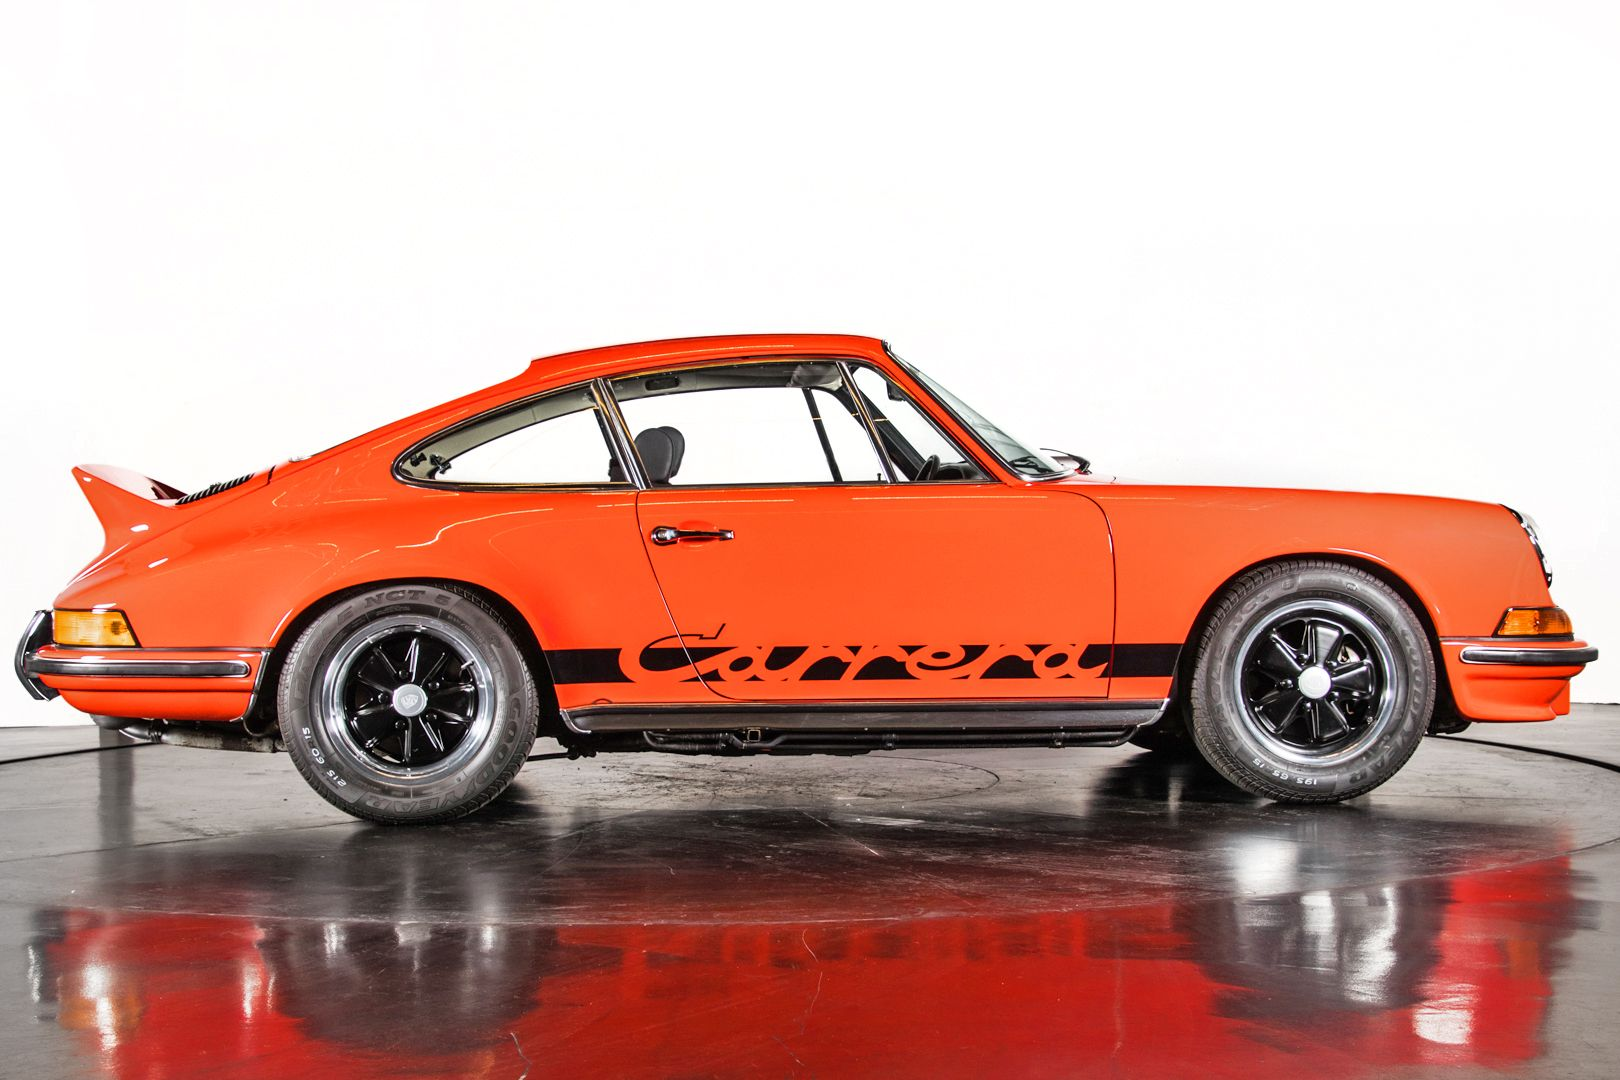 1973 Porsche 911 Carrera 2.7 RS 44397